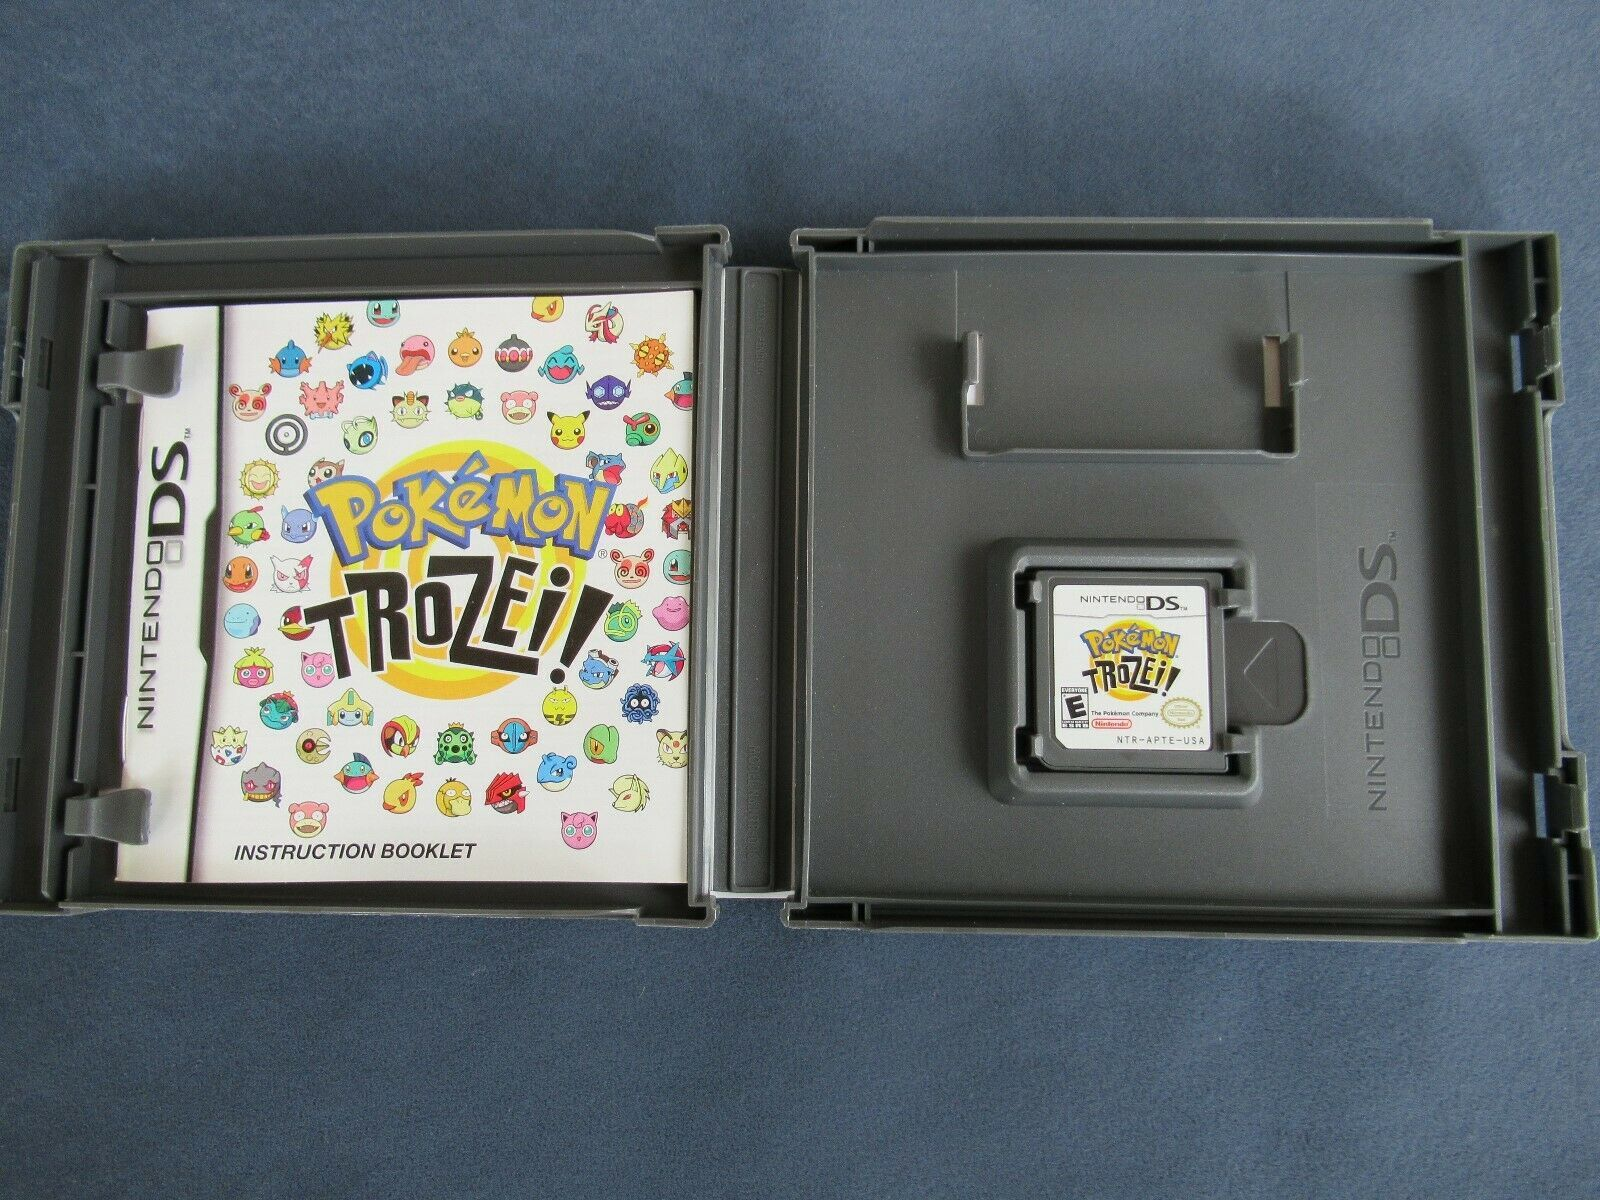 Pokemon Trozei (Nintendo DS, 2006)